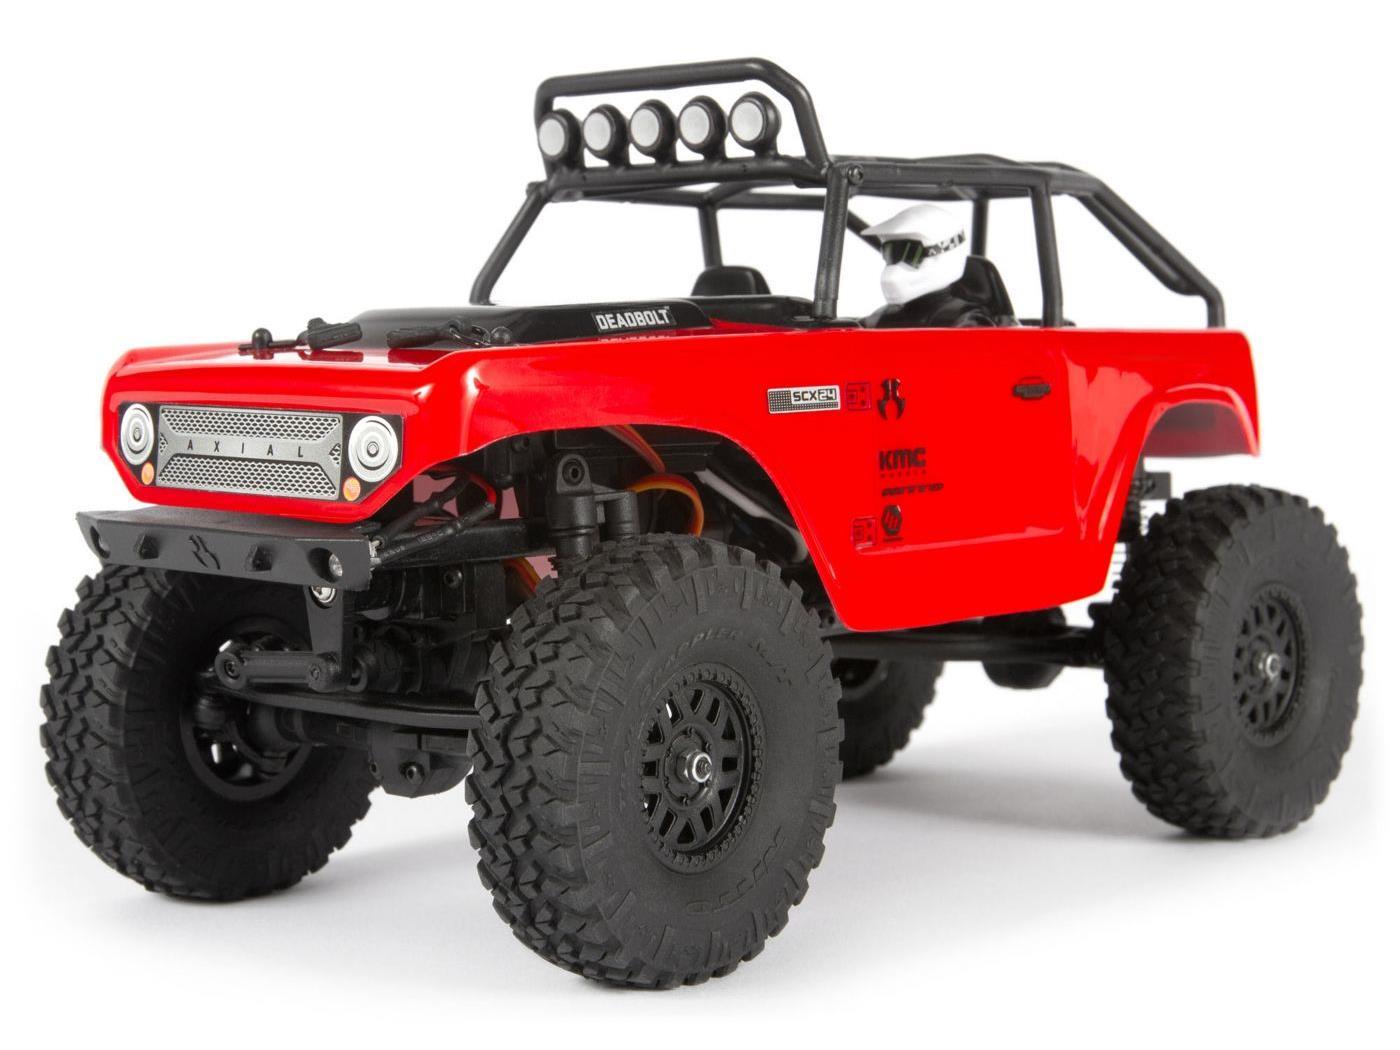 Axial SCX24 Deadbolt 1/24th Scale Elec 4WD - RTR, Red